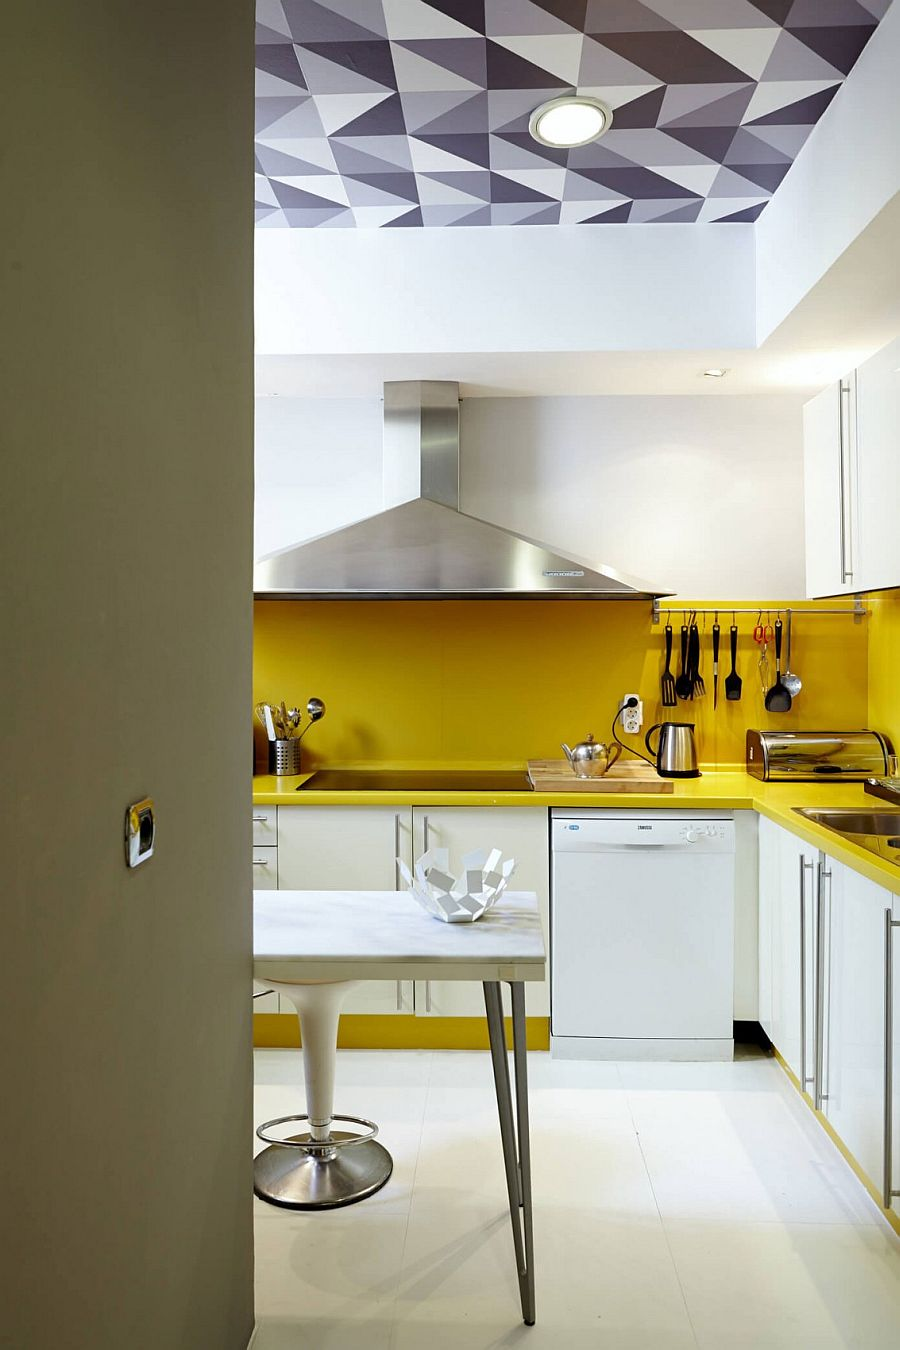 White kitchen with a vivacious yellow backsplash